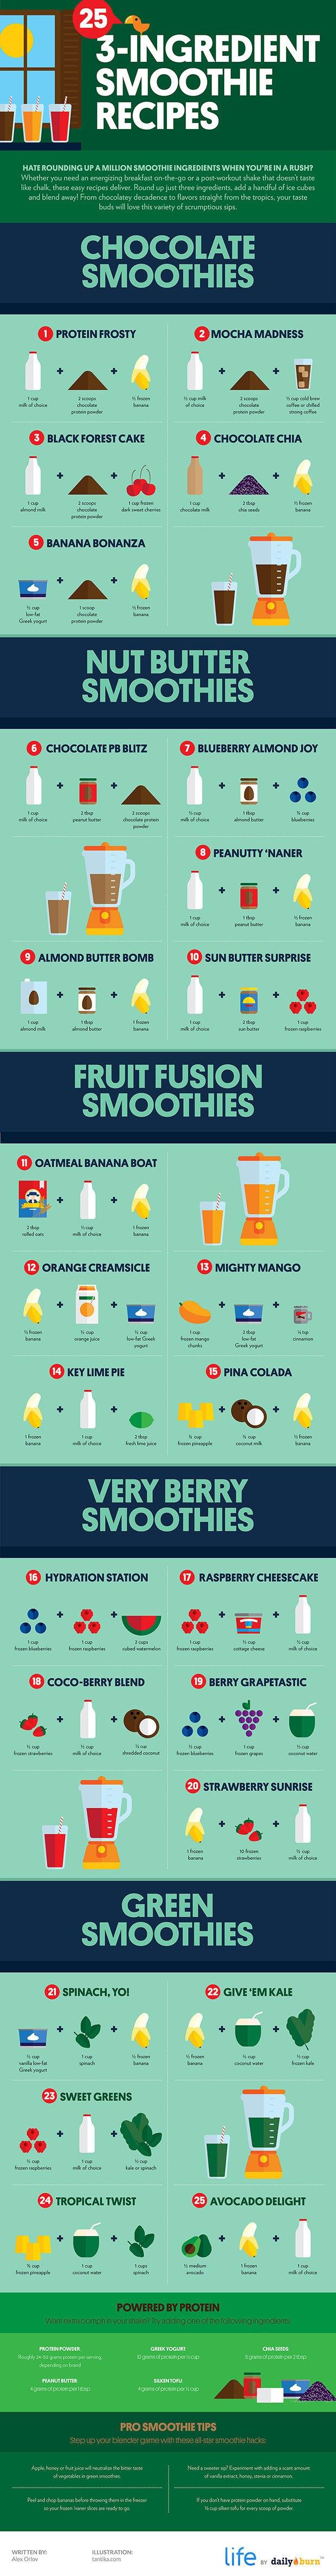 3 Ingredient Smoothie Recipes